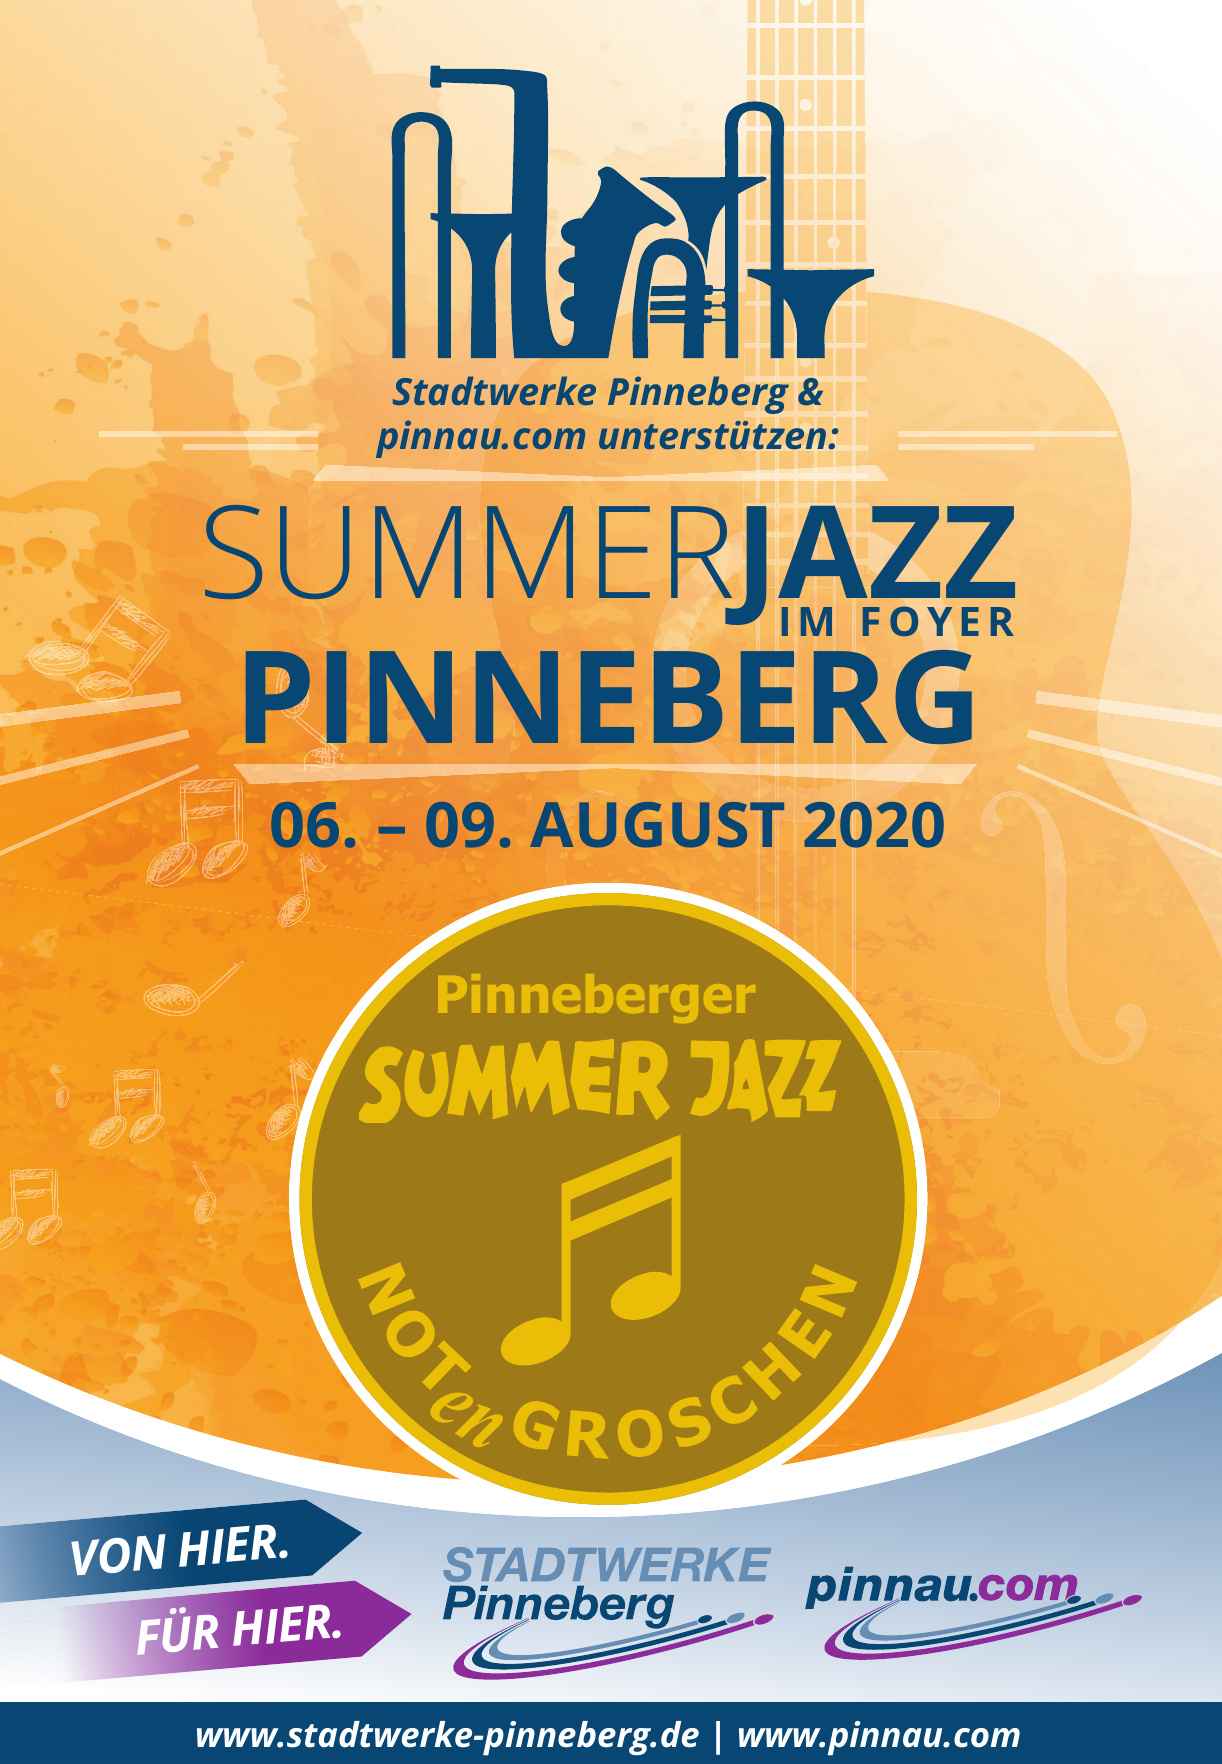 Stadtwerke Pinneberg & pinnau.com